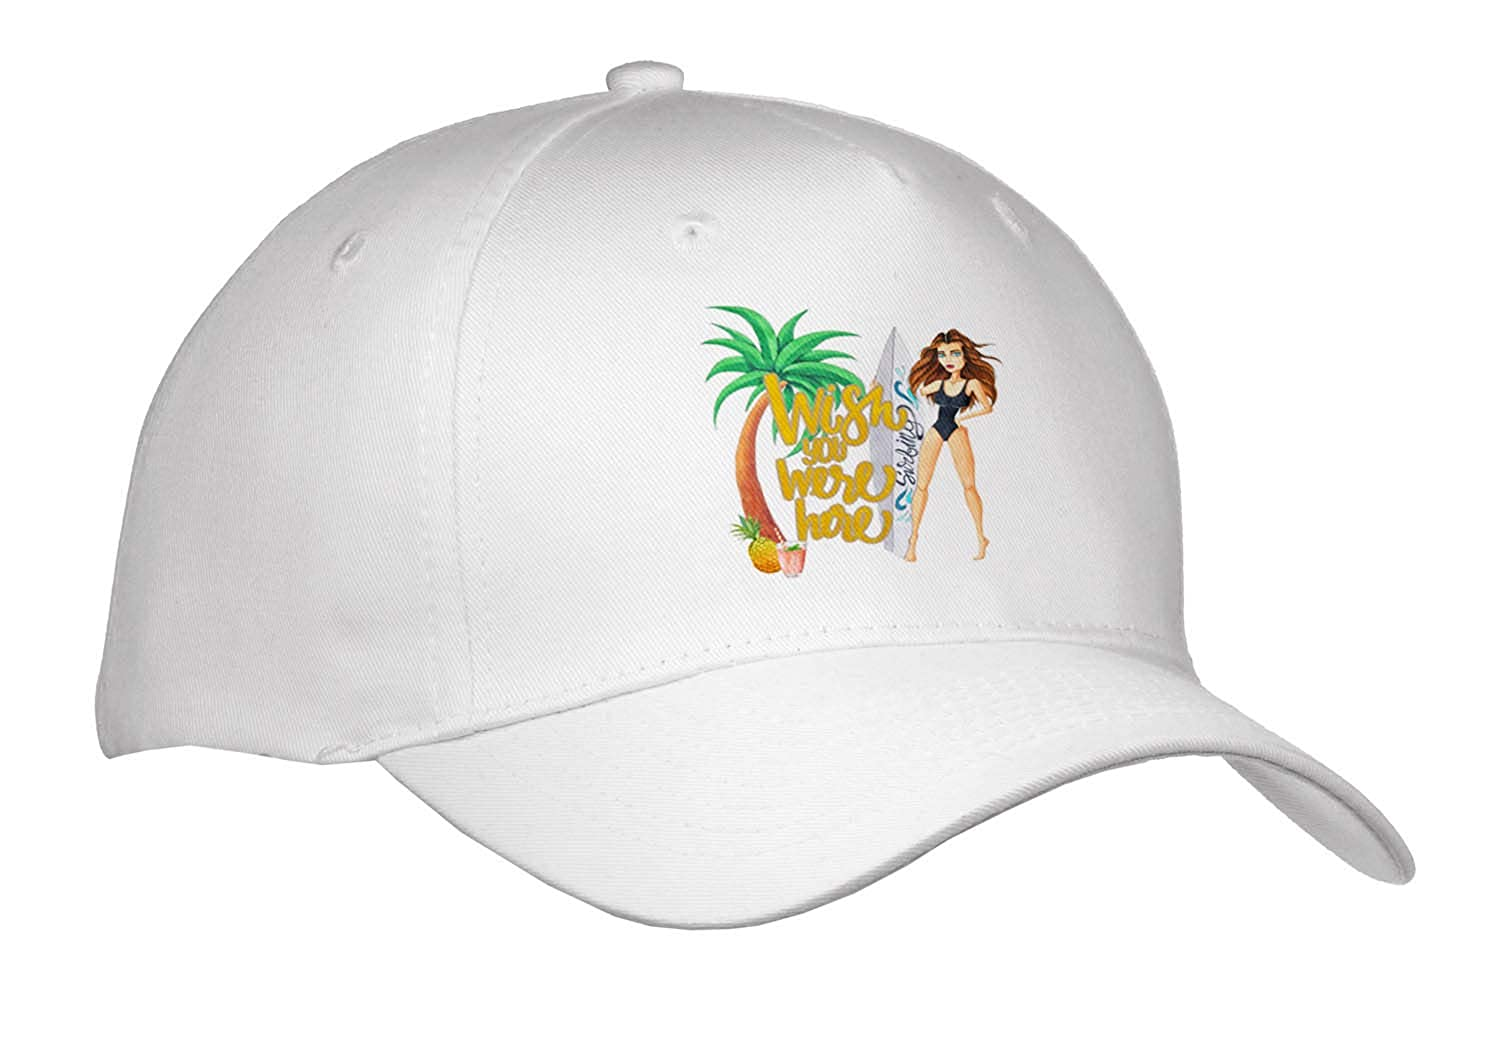 858a8cb0a Amazon.com: Uta Naumann Sayings and Typography - Summer Aloha Beach ...